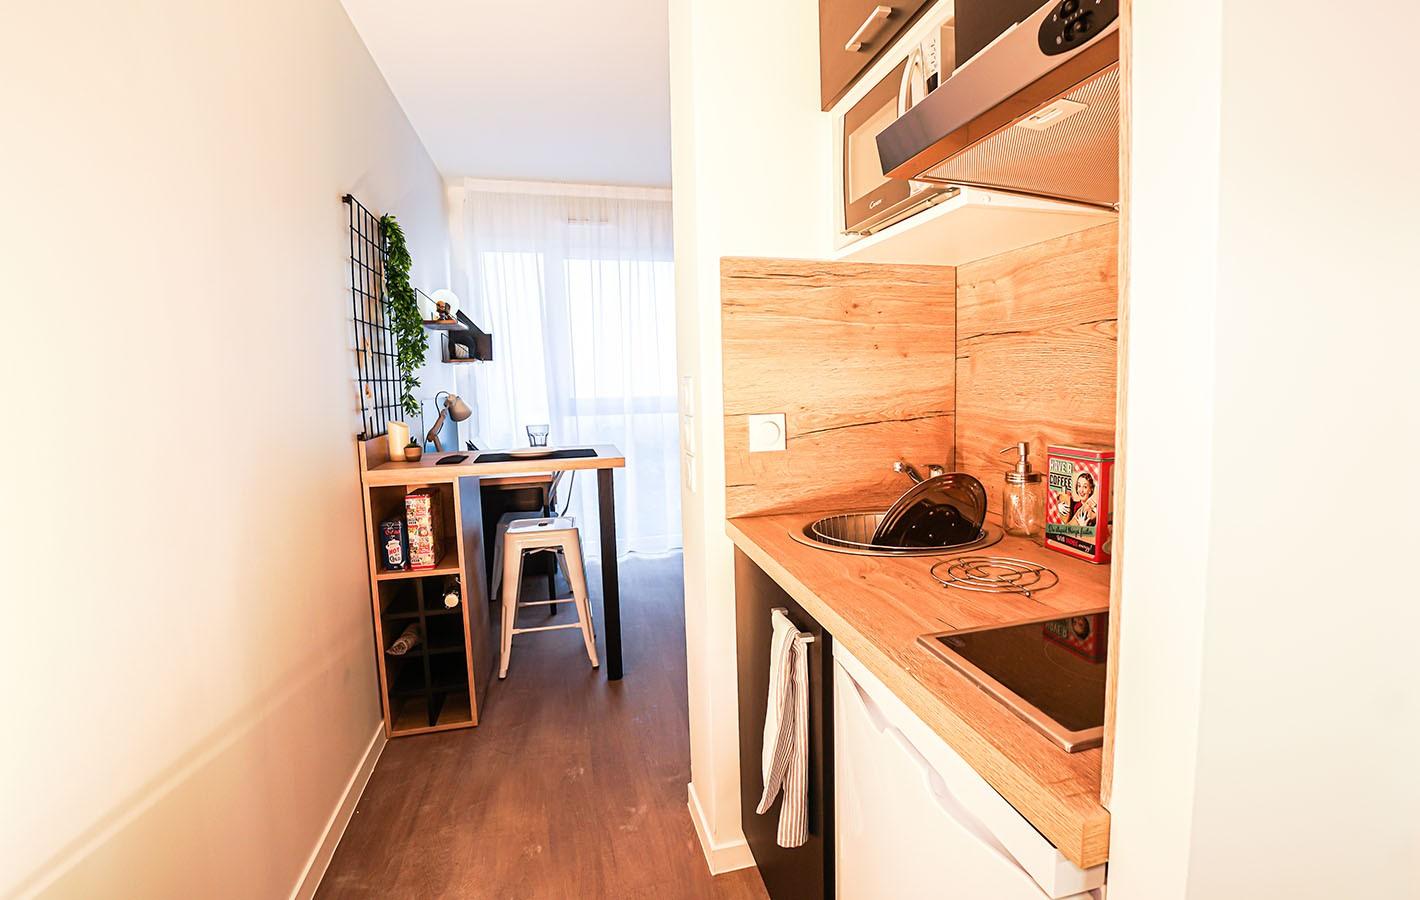 image  2021 04 15 residence etudiante suitetudes uppehalls rouen esapce cuisine